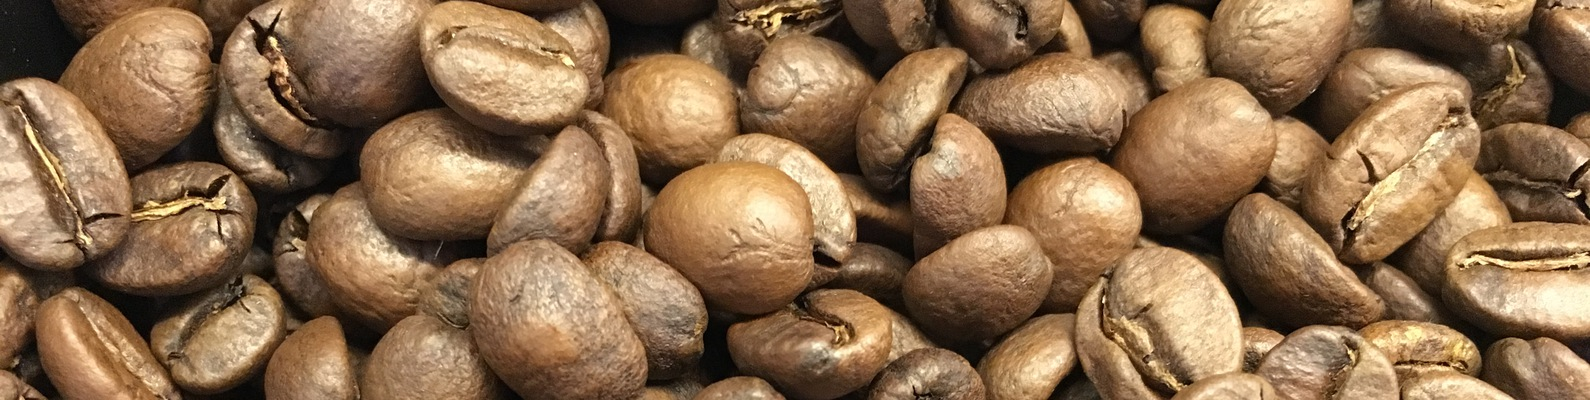 Arabica coffee blend